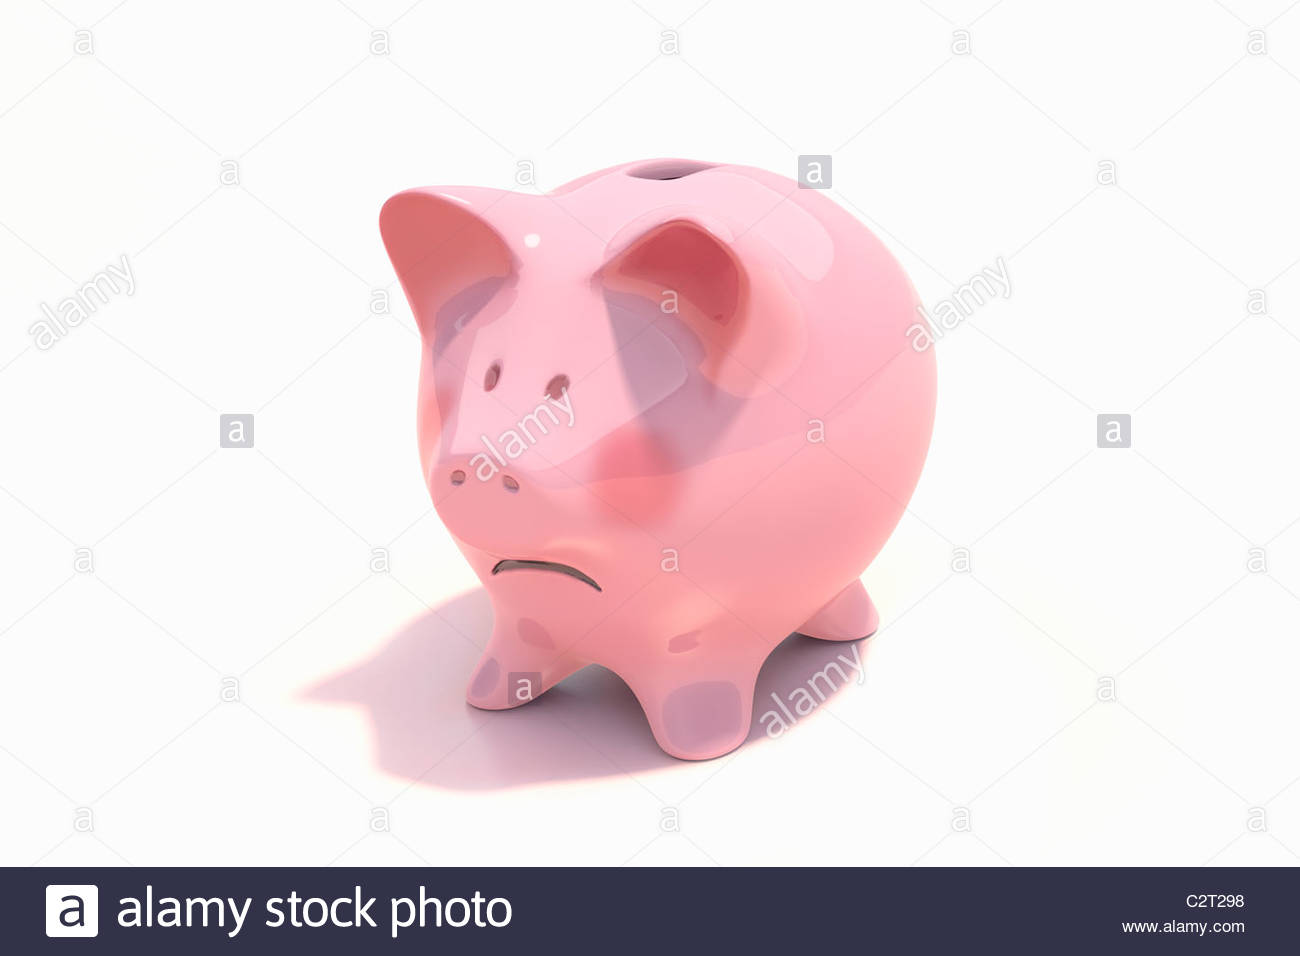 Sad piggy bank - Stock Image